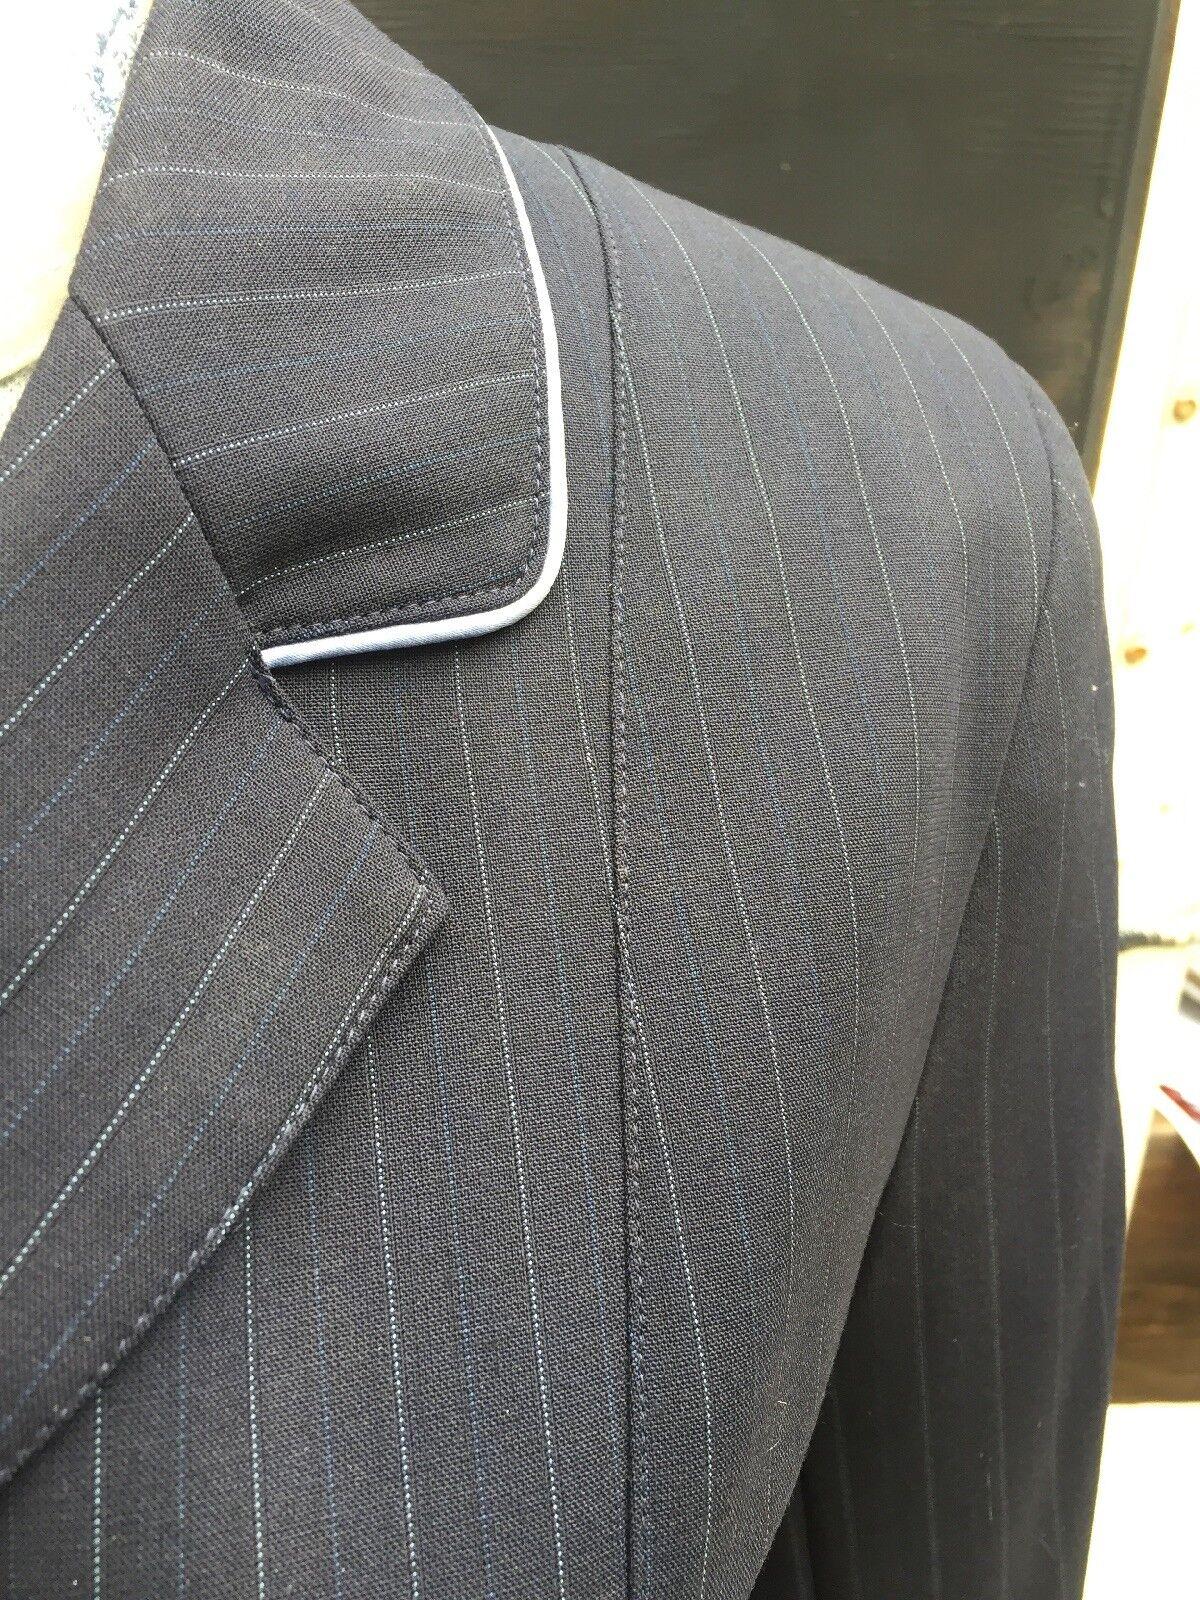 Herve Godignon Coat, Ladies Show Coat, Godignon Navy, Size 10 (Euro 40) 84a864